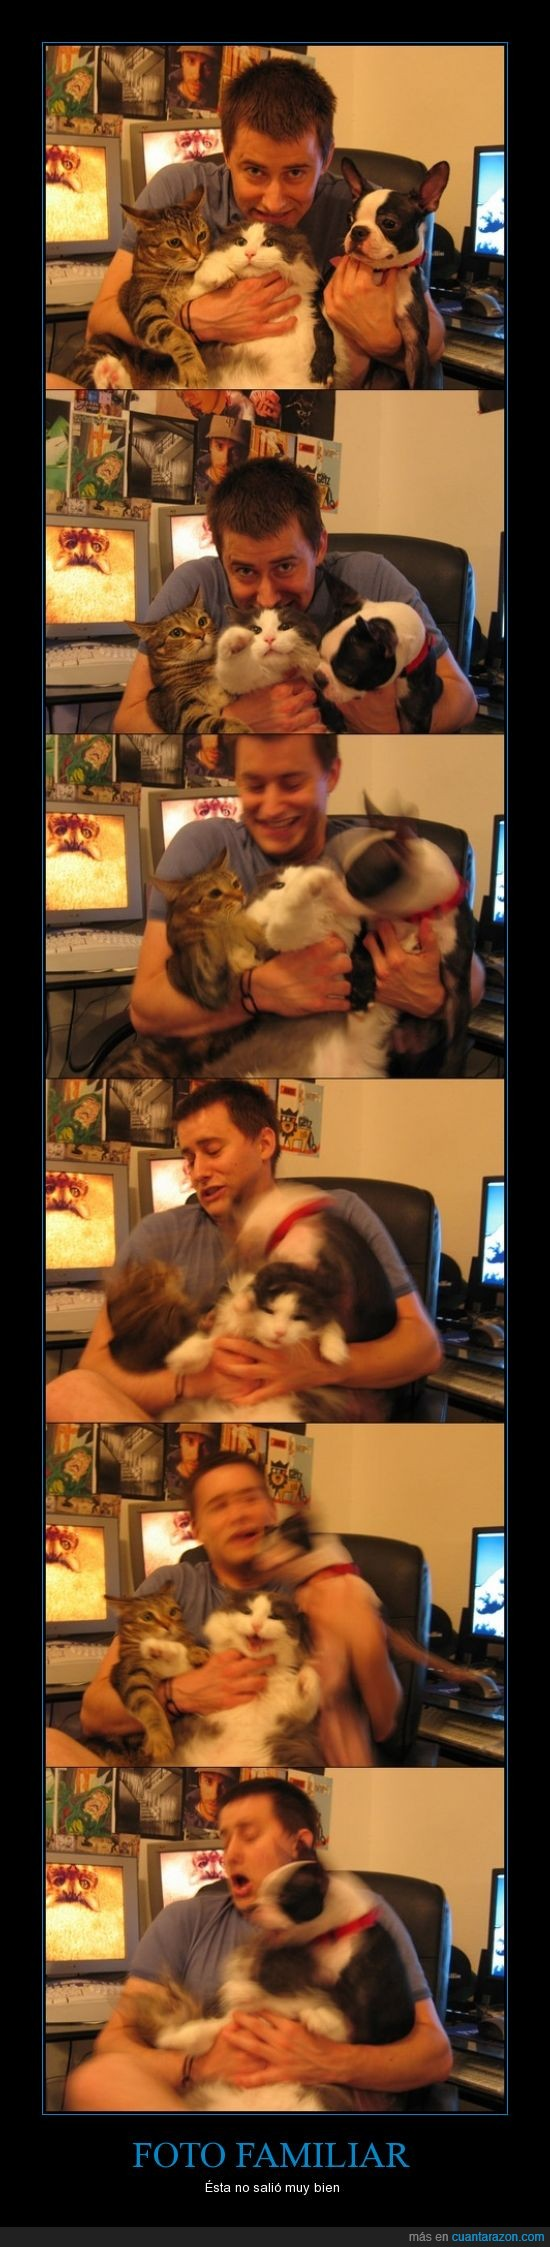 atacar,desastre,familia,foto,Gatos,hombre,mover,perro